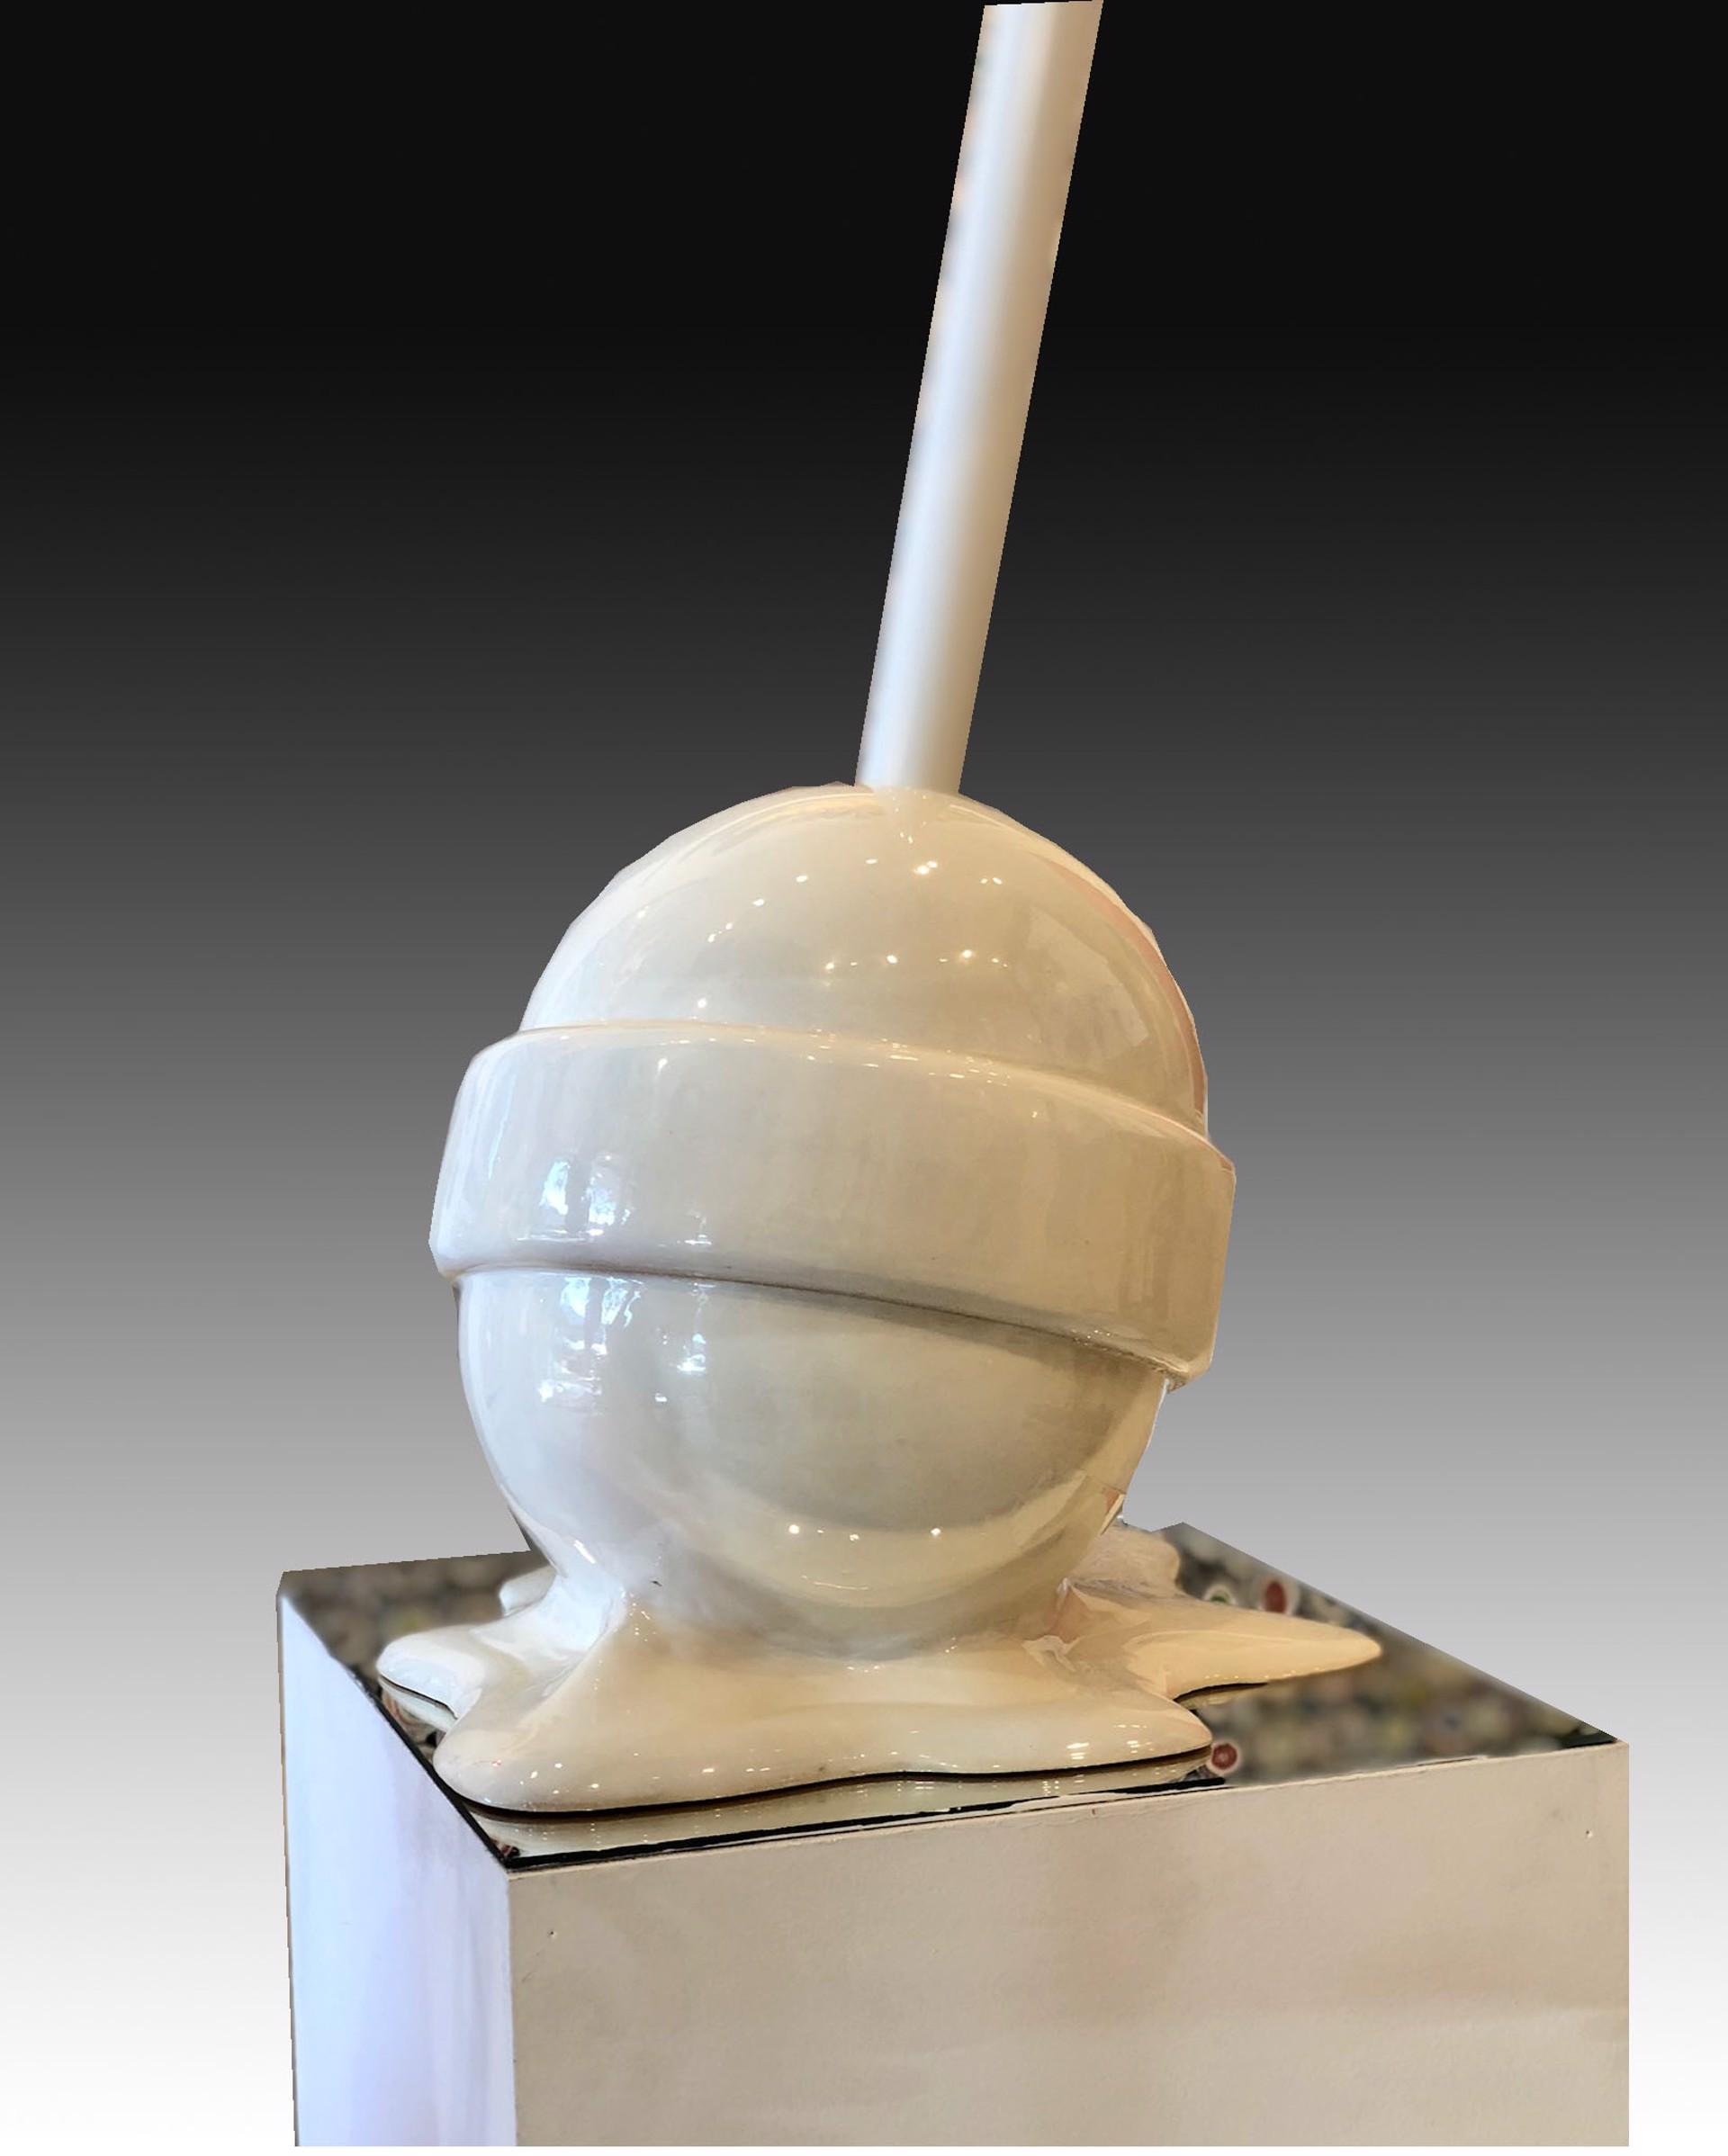 """The Sweet life"" Medium White lollipop by Elena Bulatova"